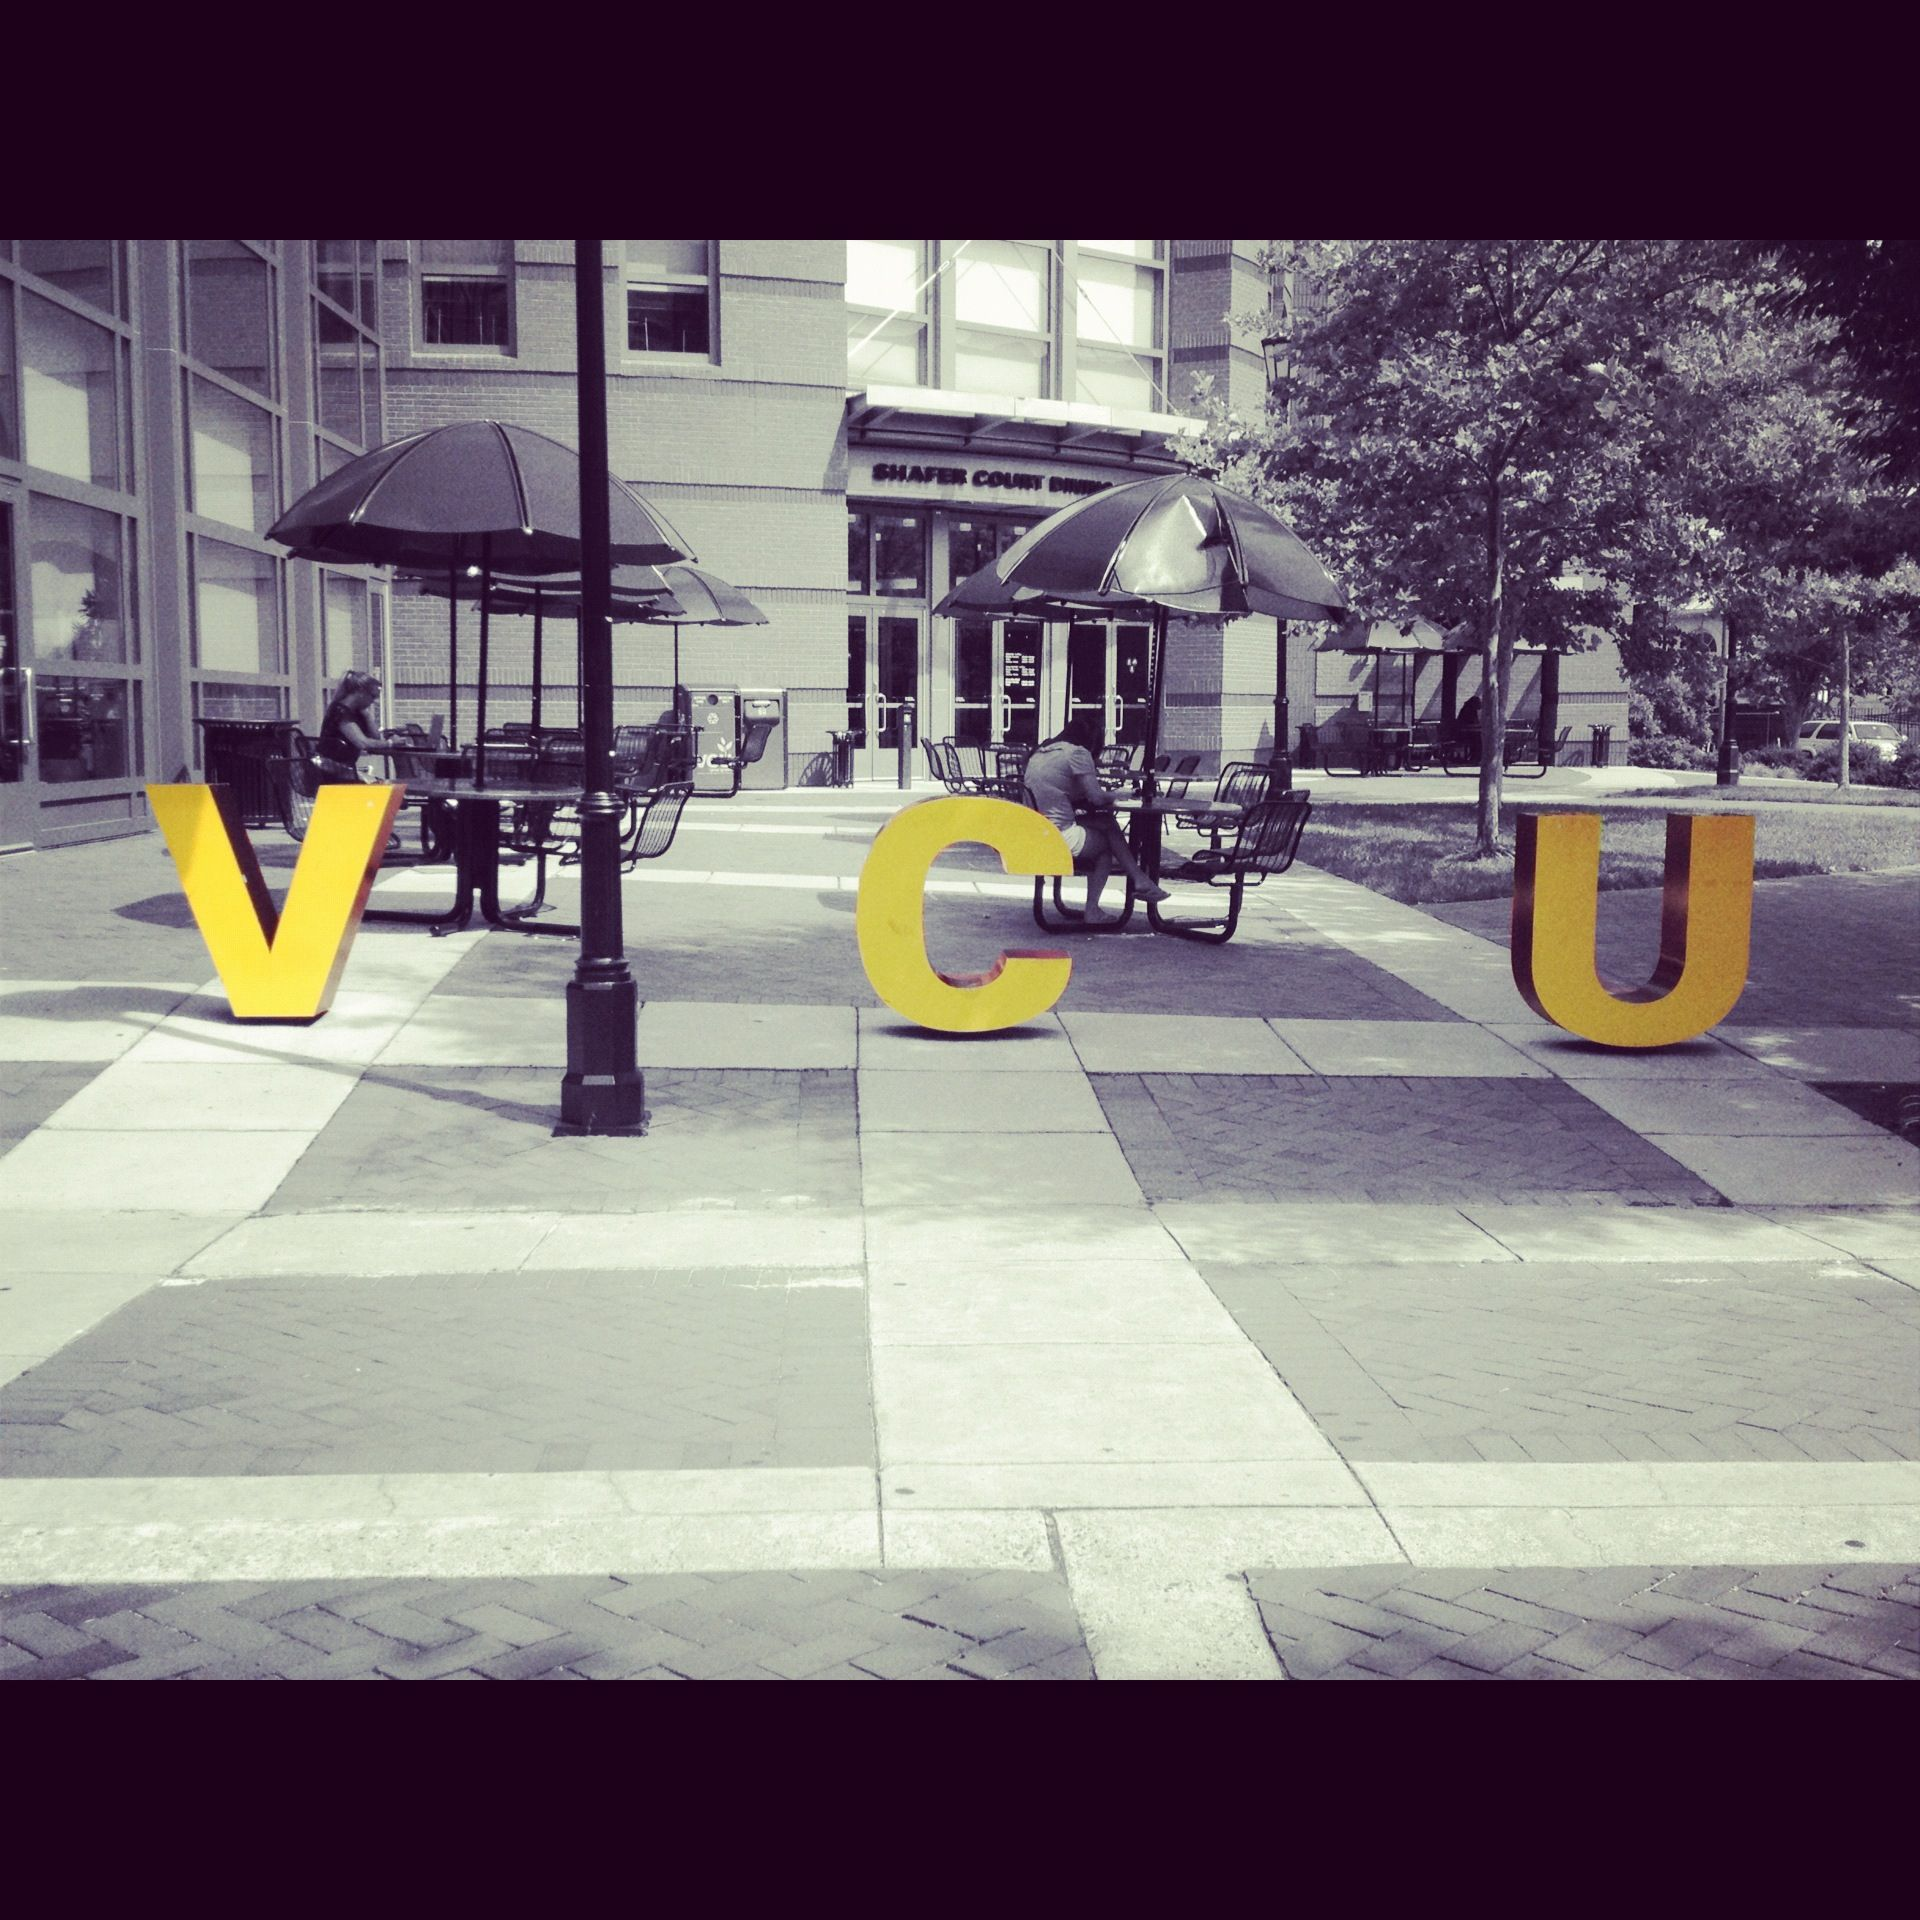 Pin By Macoia On Rams Nation Vcu University Of Richmond Virginia Commonwealth University